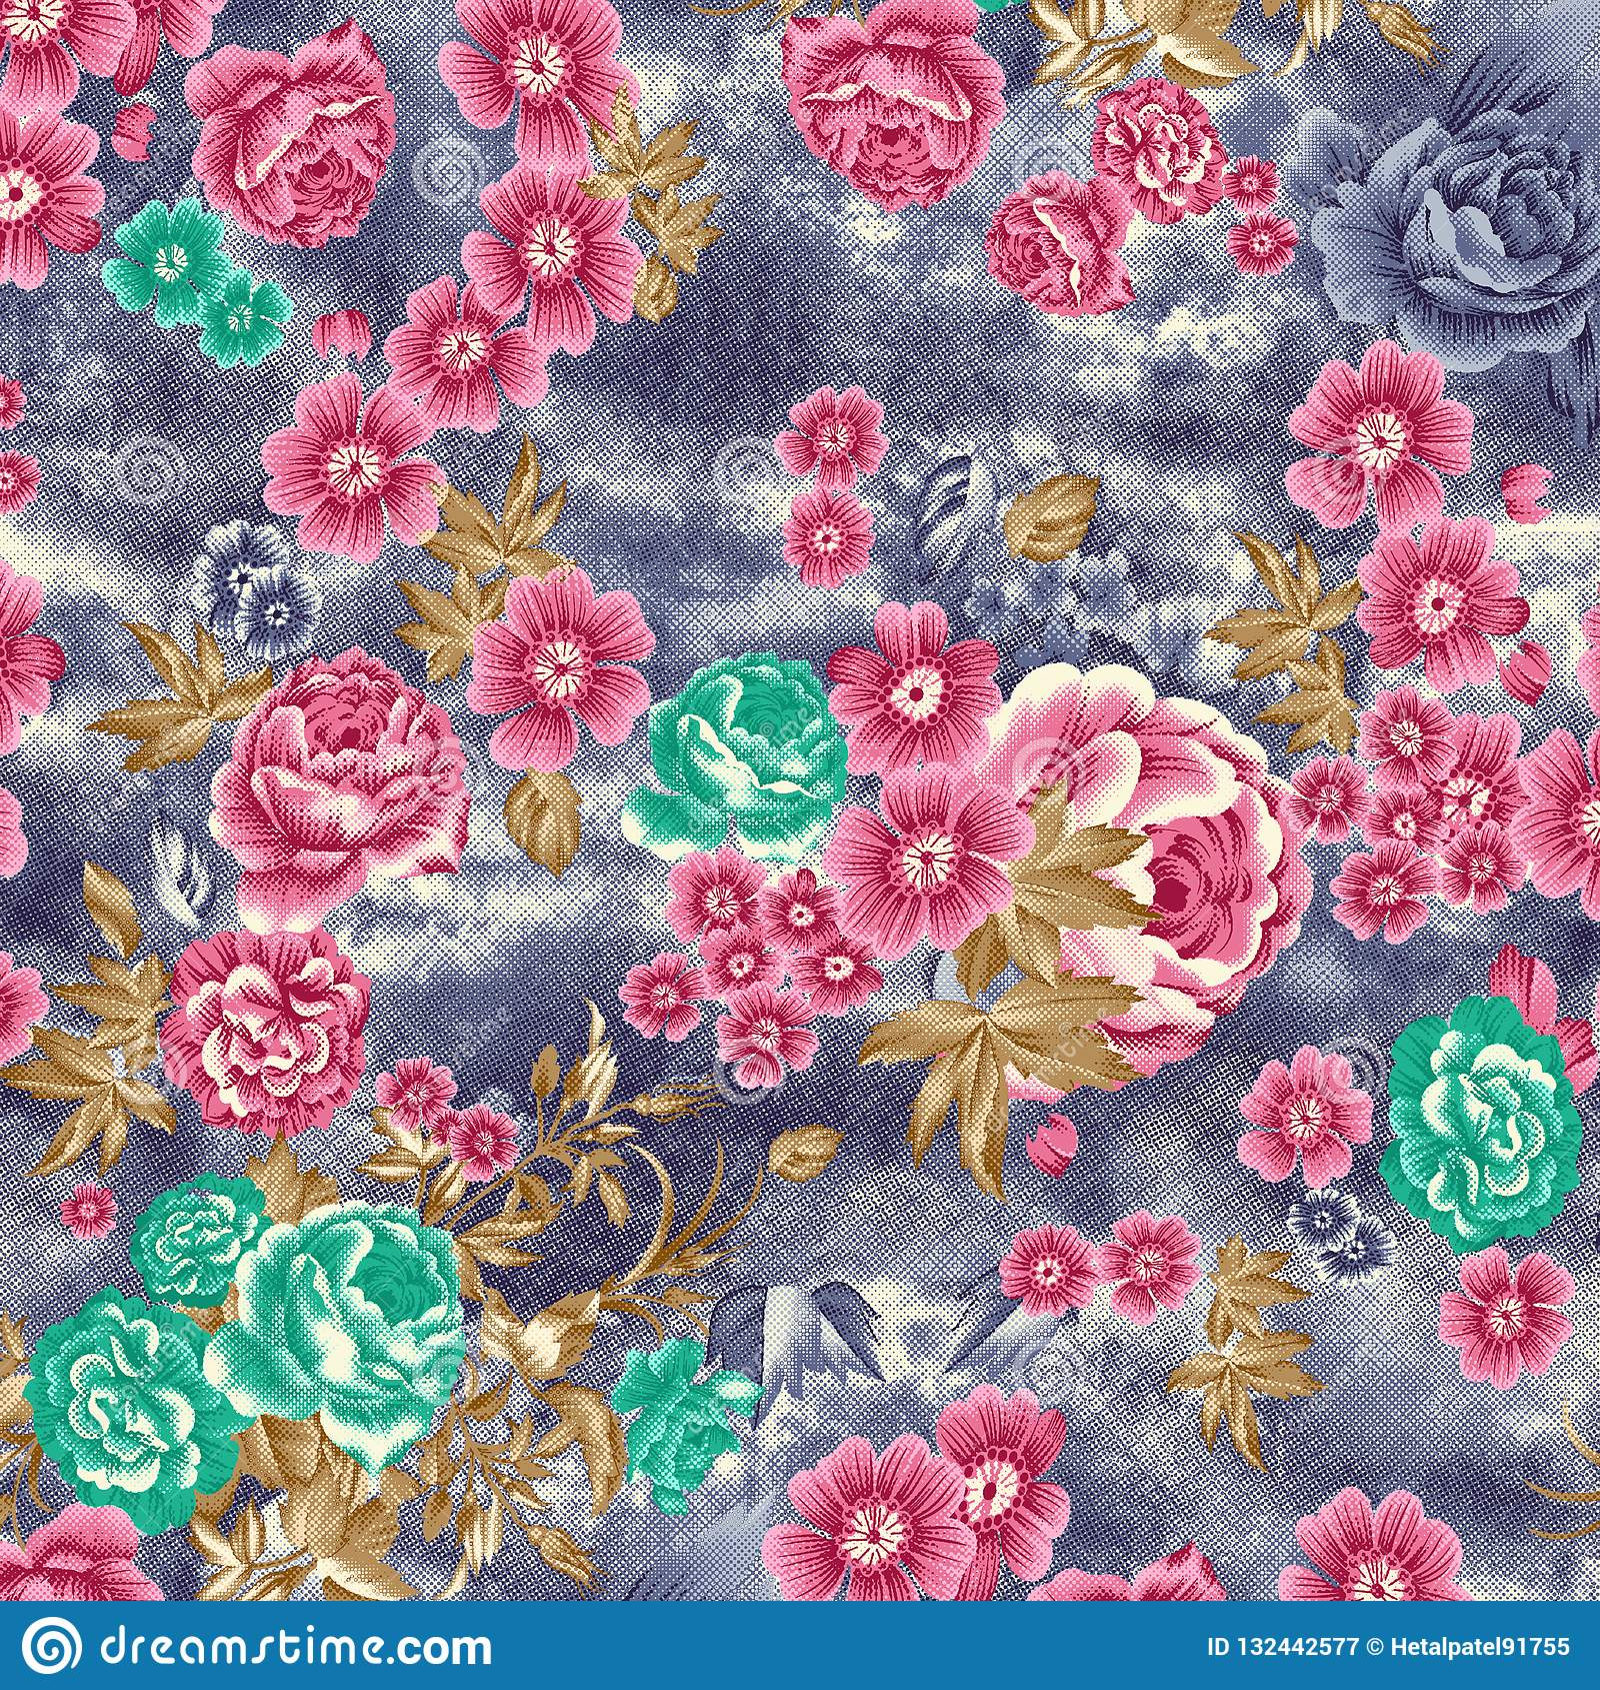 Watercolor raster flower pattern on texture